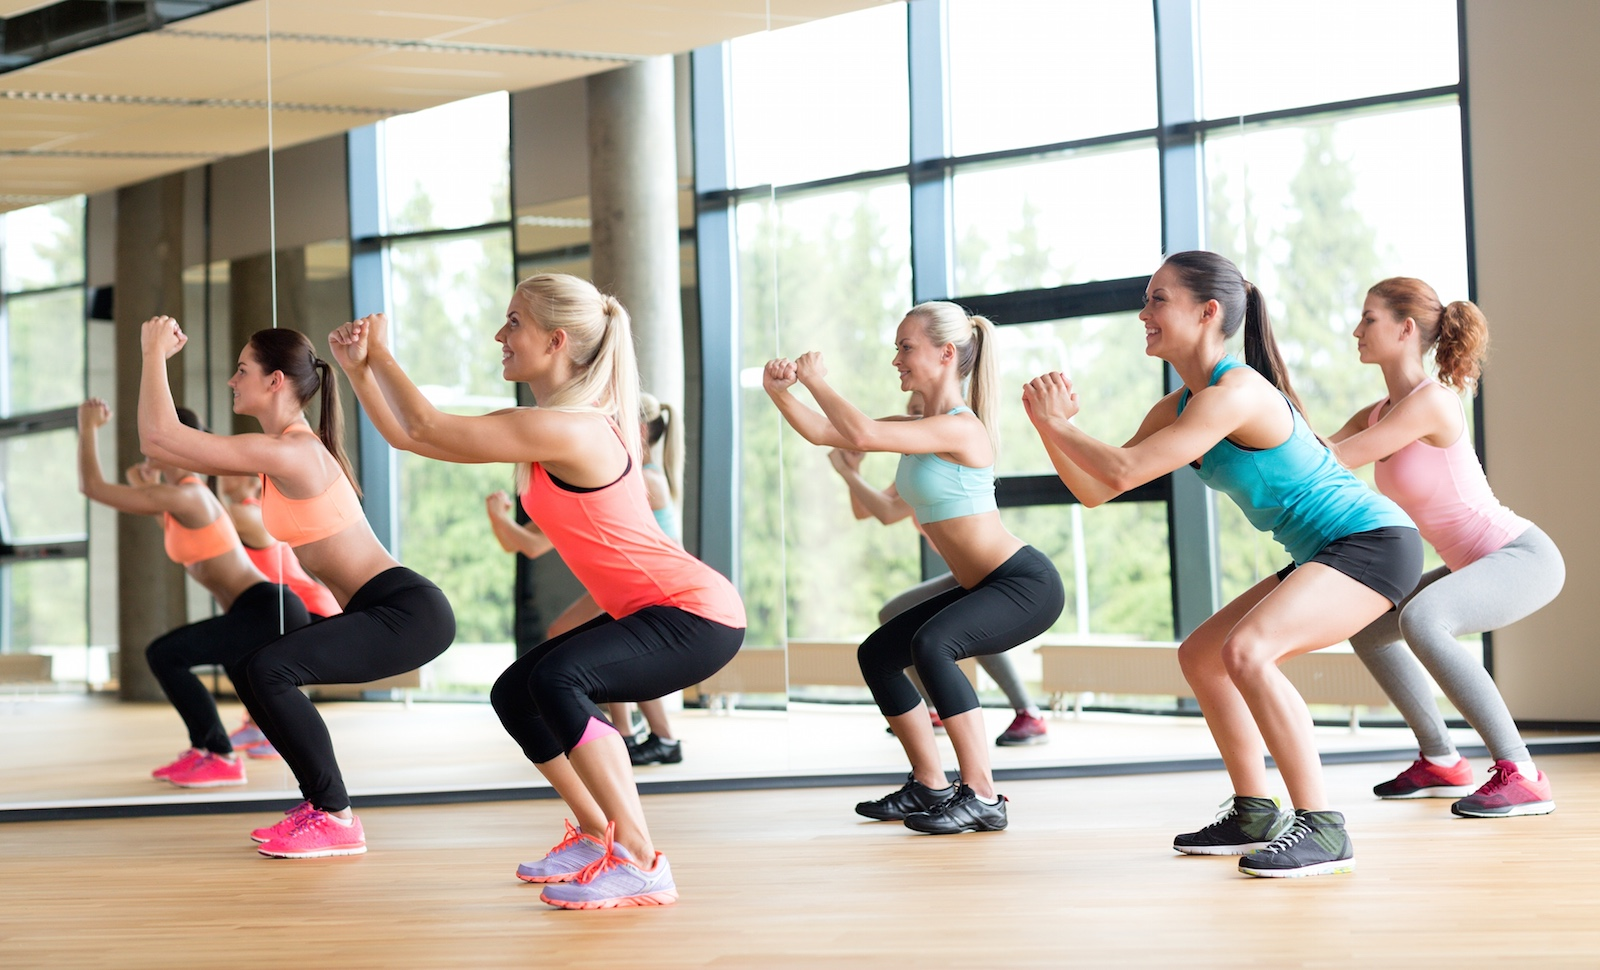 laguna-beach-gym-group-training-LO